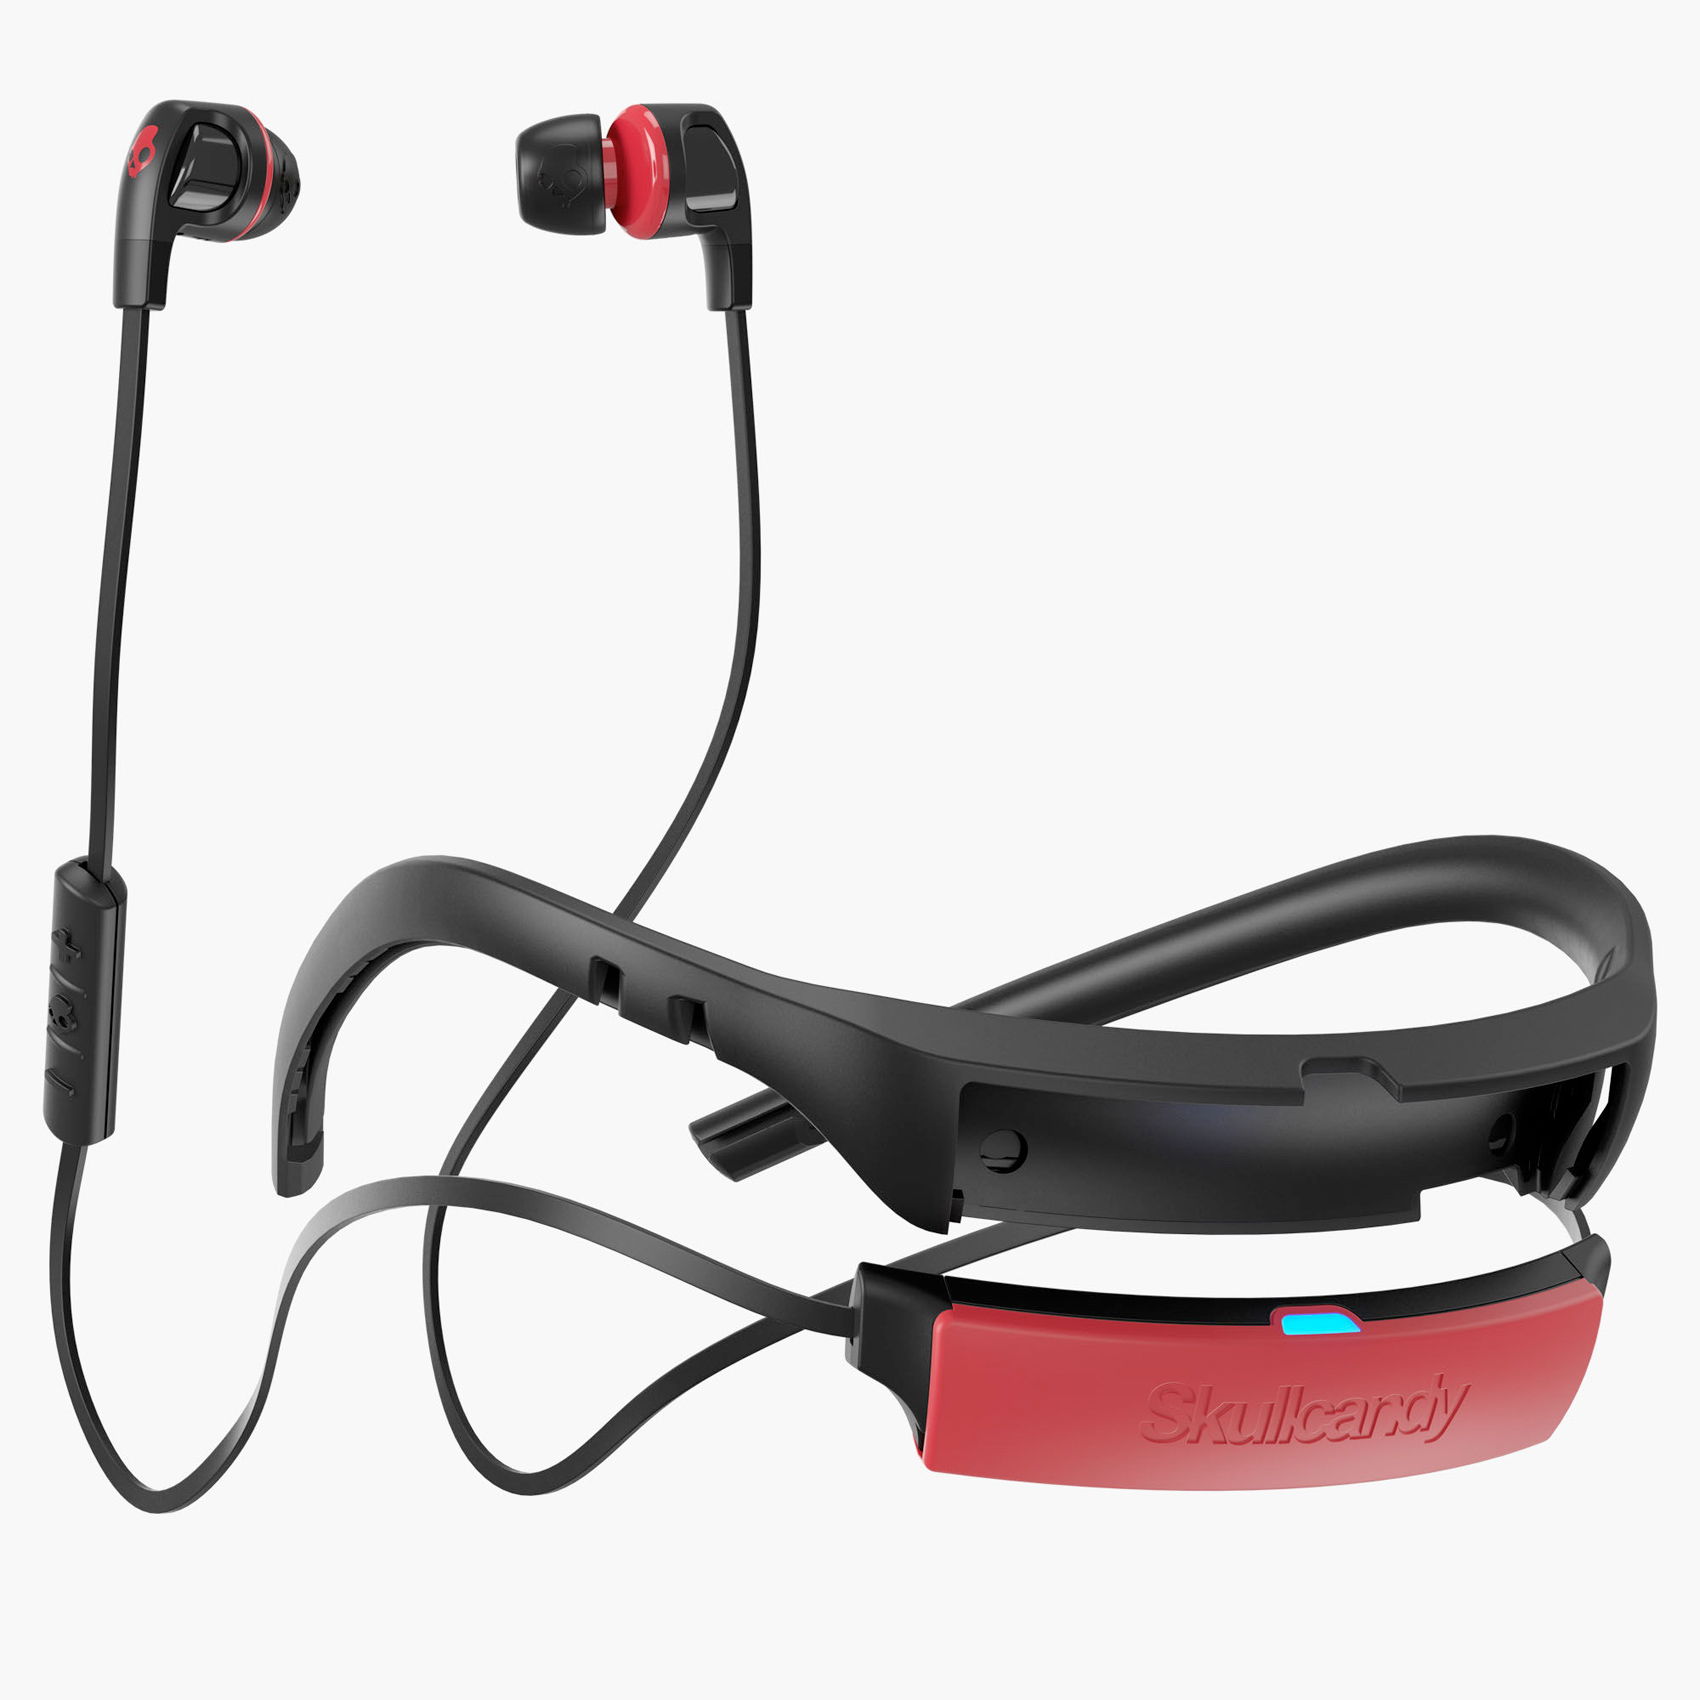 Wireless headphones not bluetooth - headphones with microphone not wireless